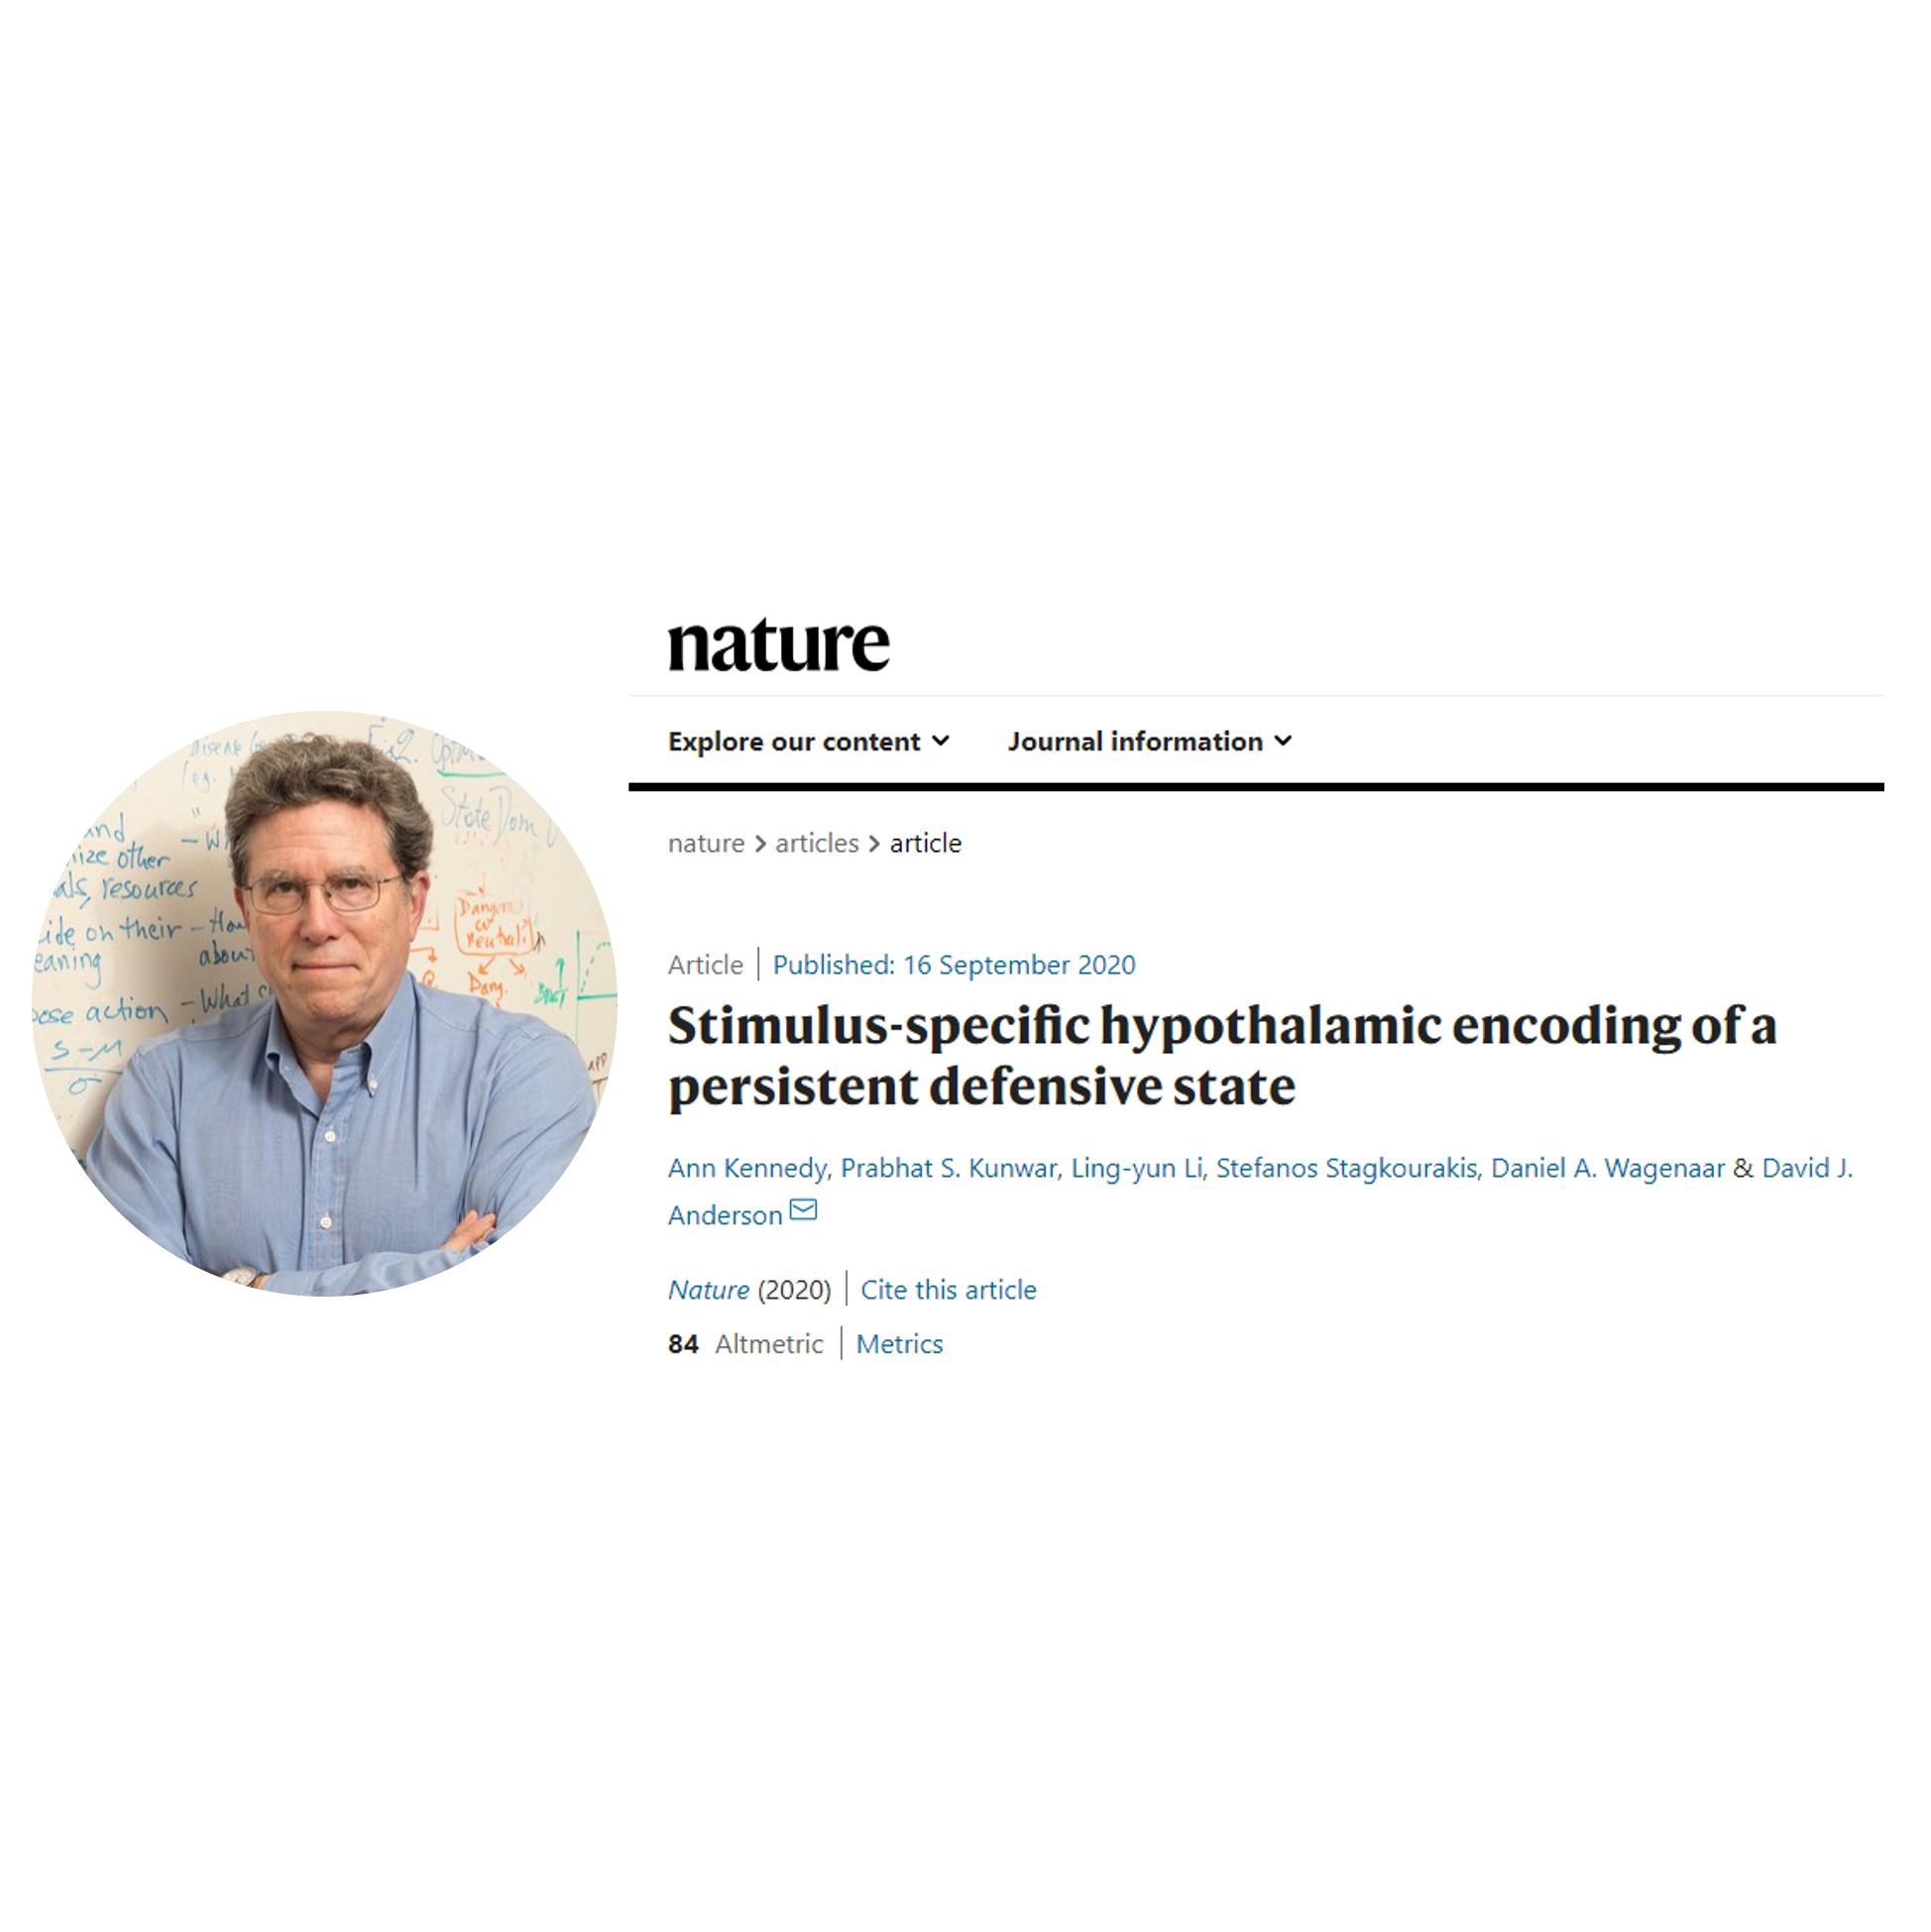 David J. Anderson NATURE新作 | 下丘脑特异性刺激编码持久的防御状态